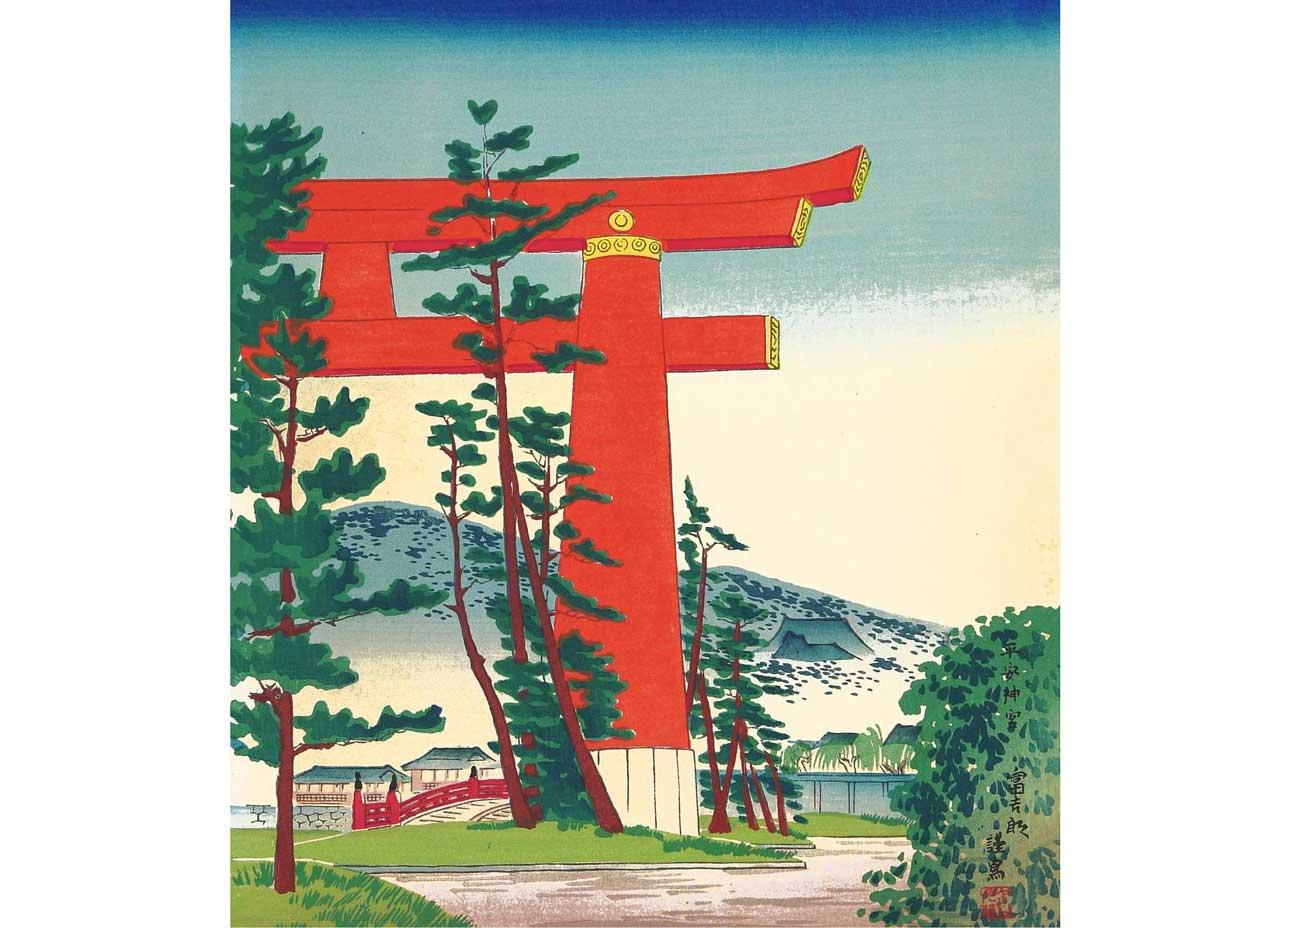 © Tokuriki Tomikichiro, Heian Shrine, 1950s Woodblock Print